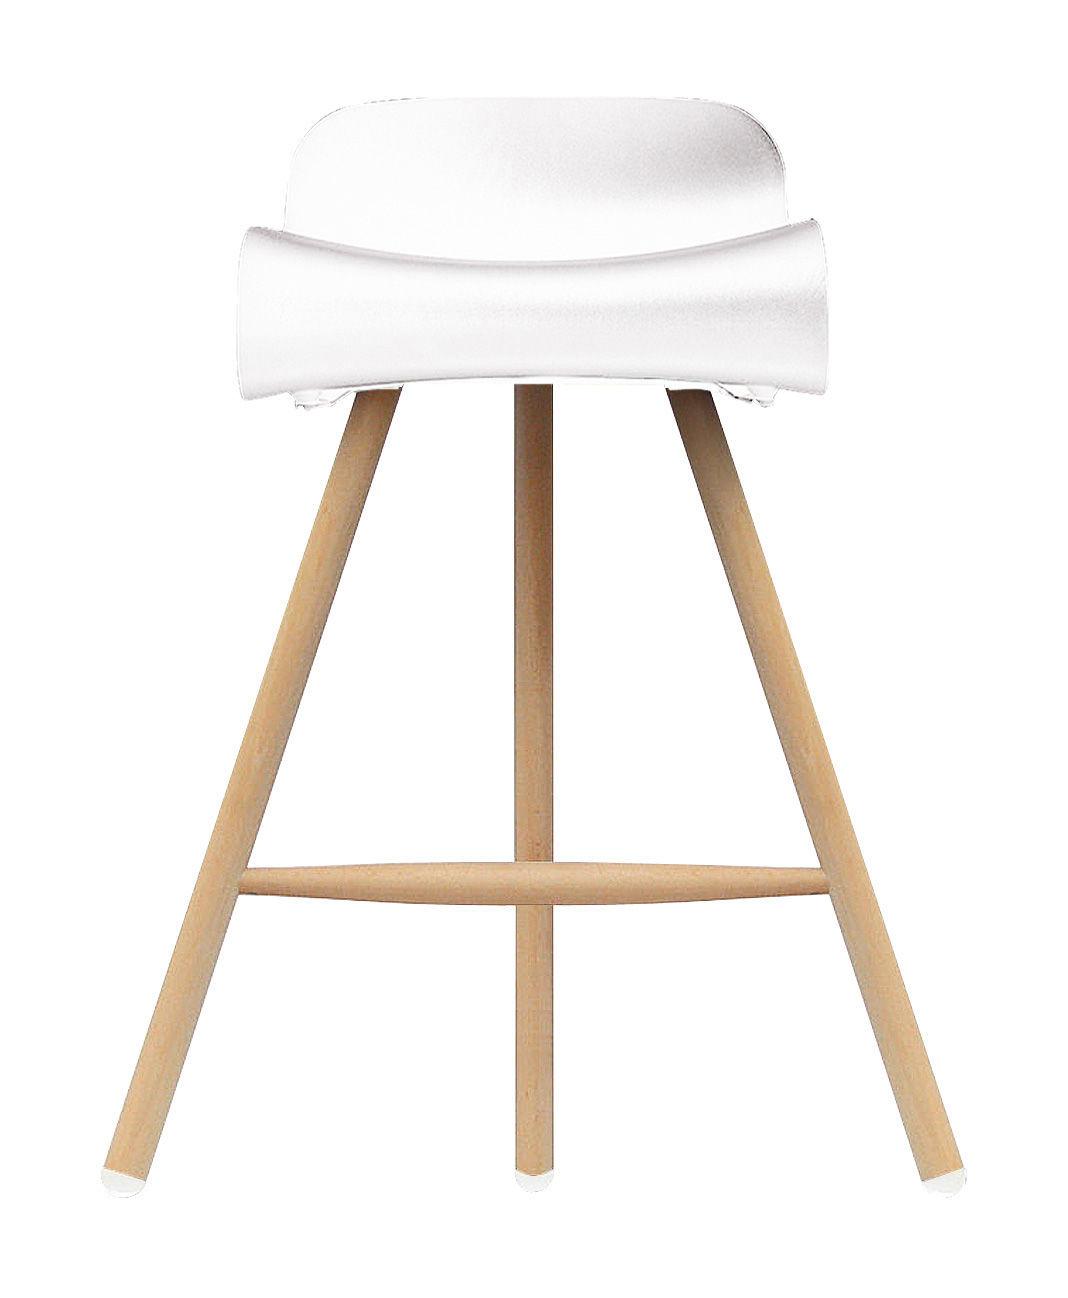 Furniture - Bar Stools - BCN Wood Bar stool - H 66 cm - Plastic & wood legs by Kristalia - Natural wood / White - Beechwood, Plastic material